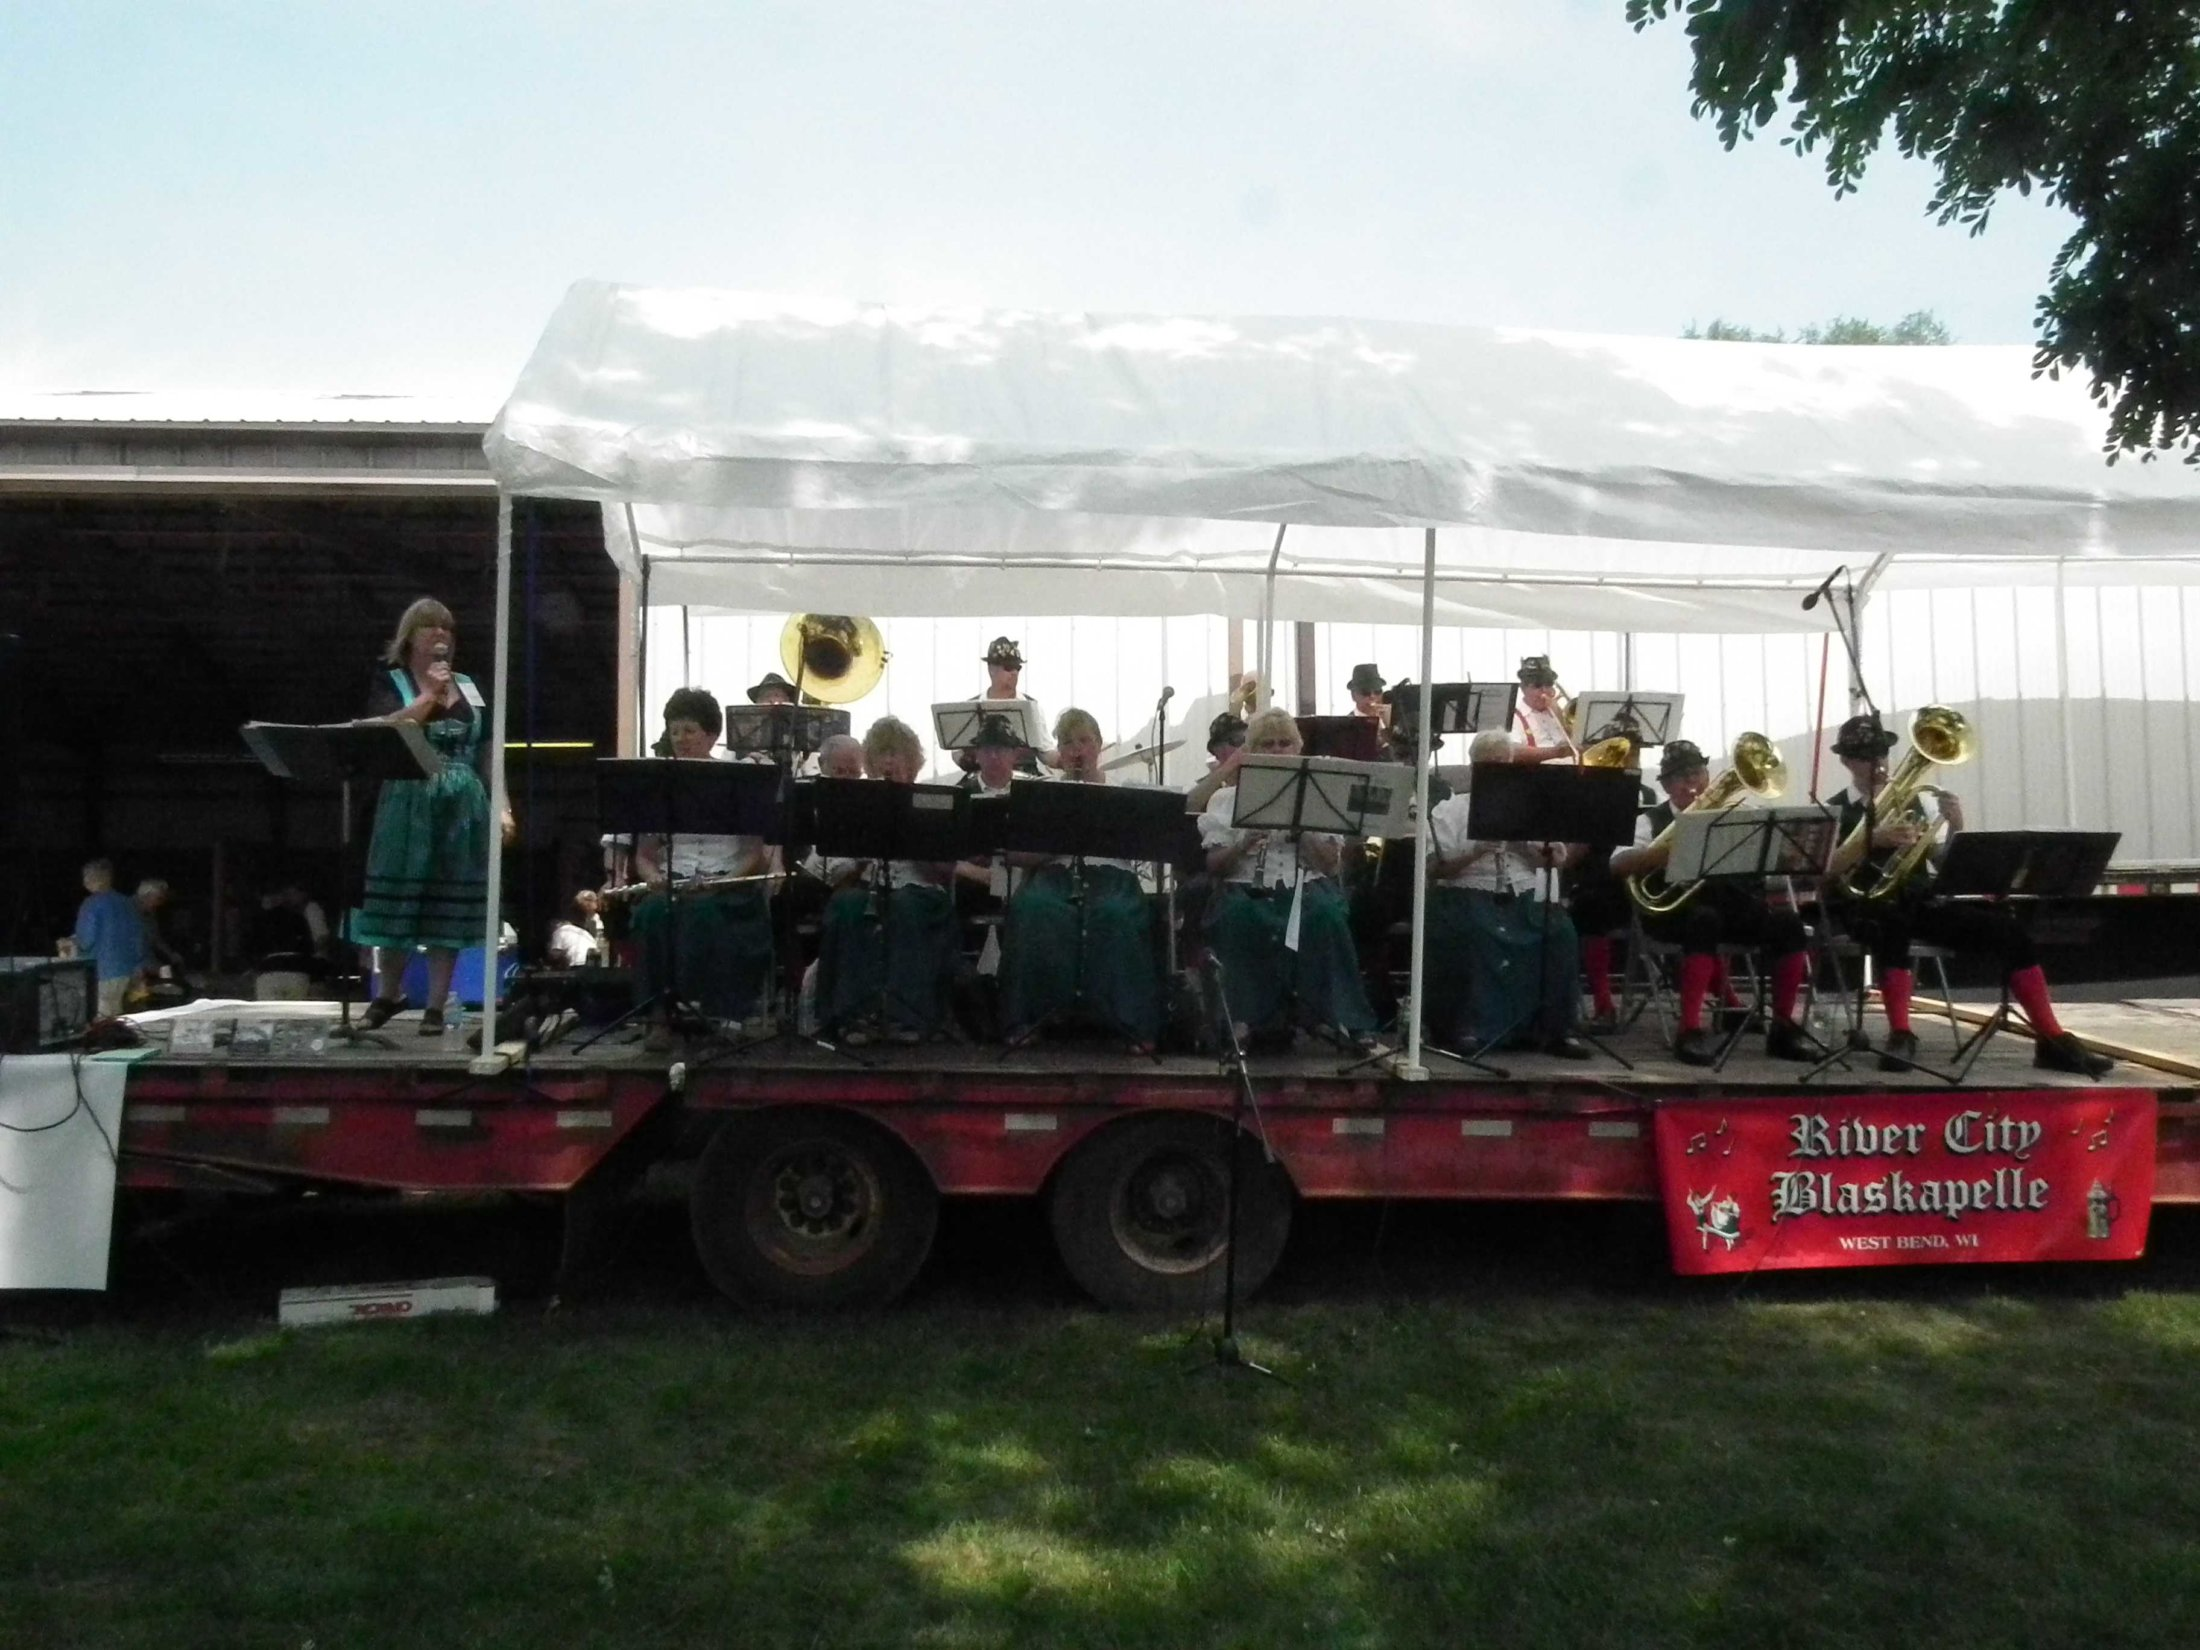 River City Blaskapelle (wind ensemble)